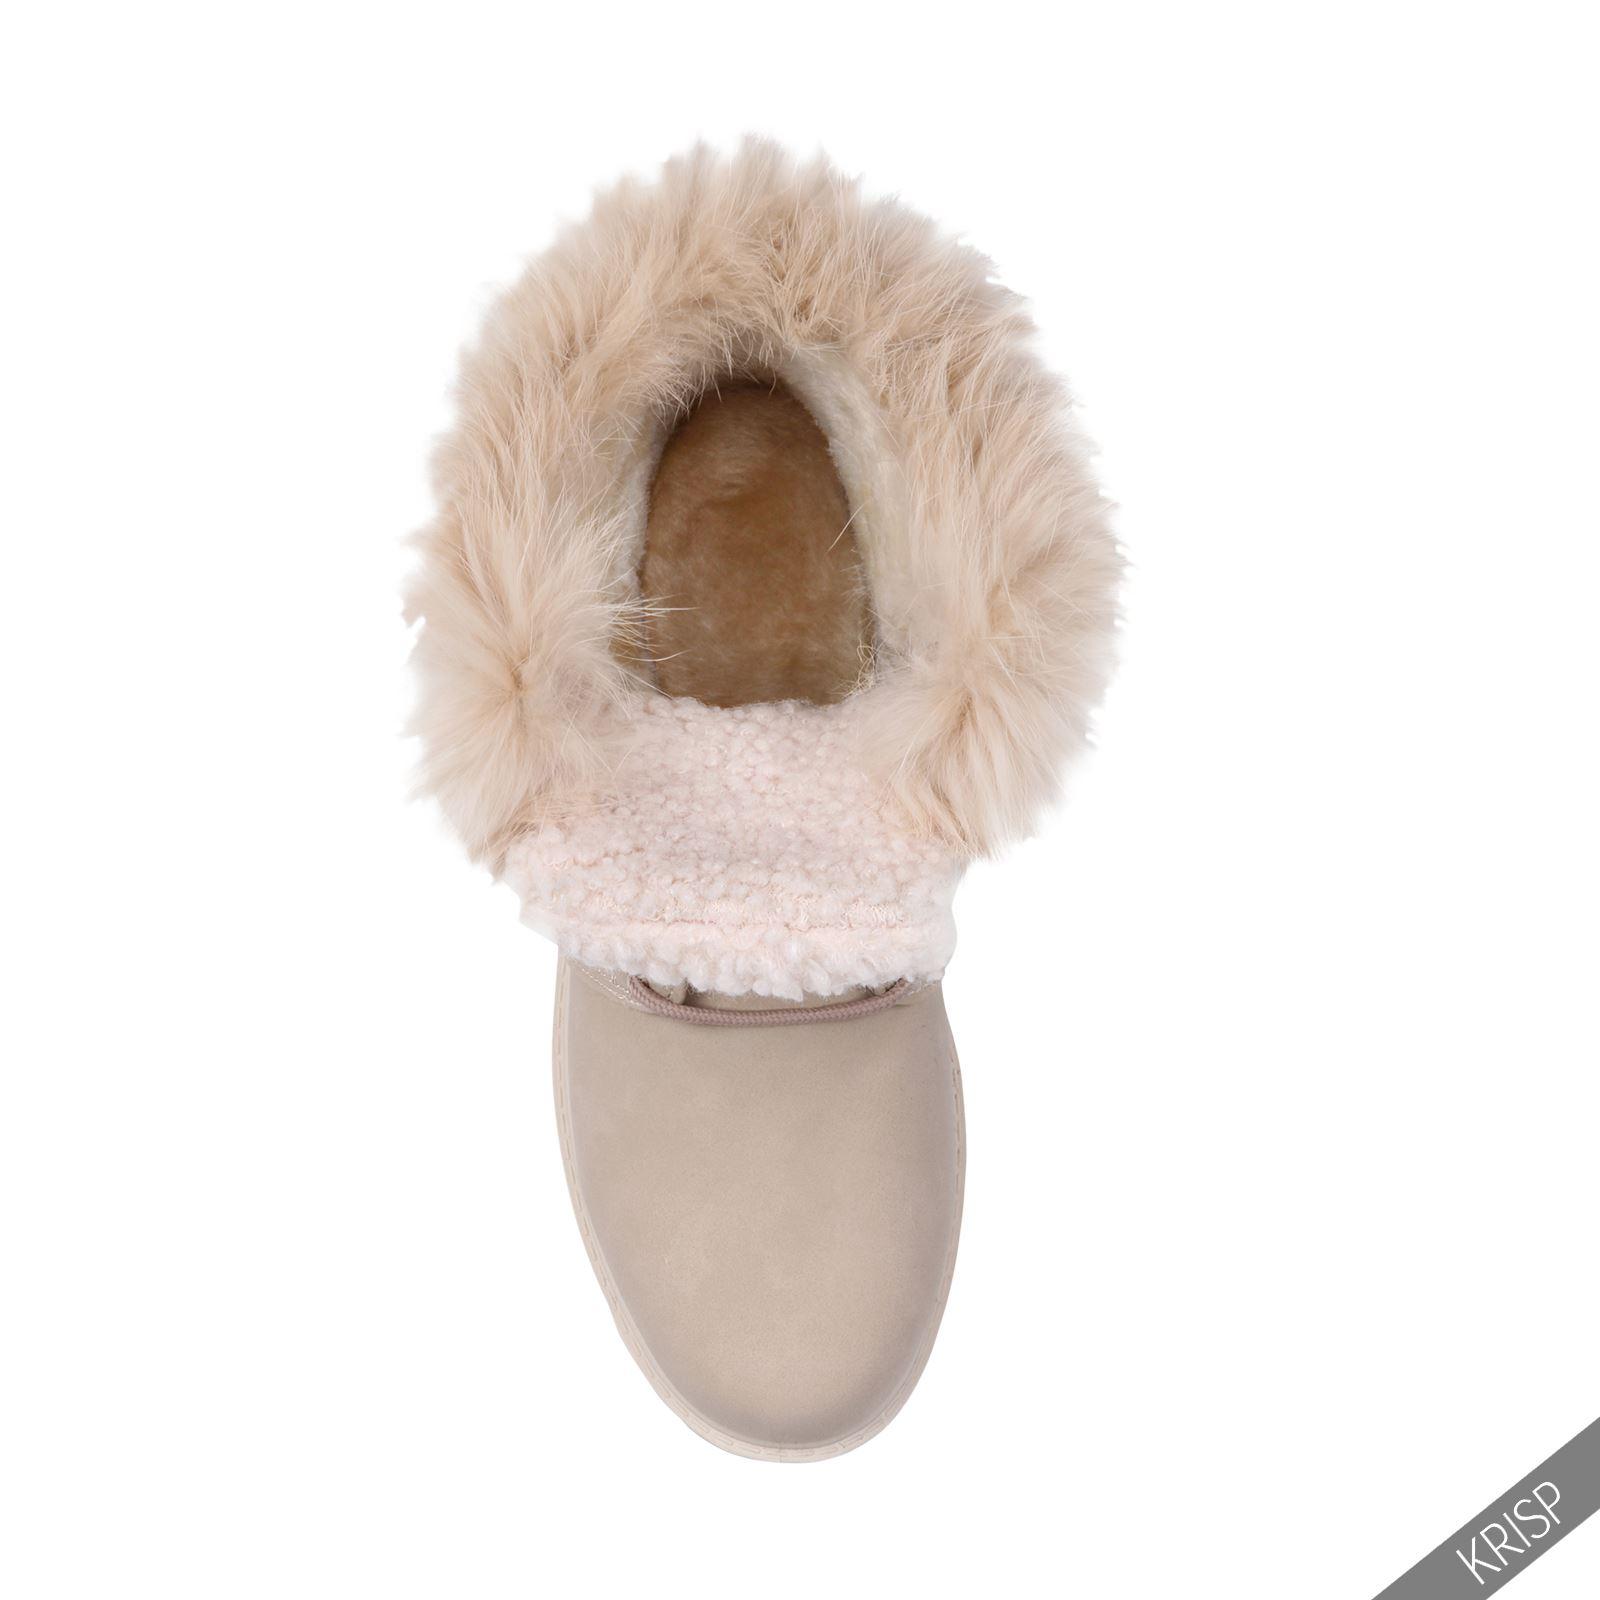 Botines-Mujer-Camel-Bota-Plana-Suela-Goma-Cordones-Casual-Otono-Invierno-Tacon miniatura 23